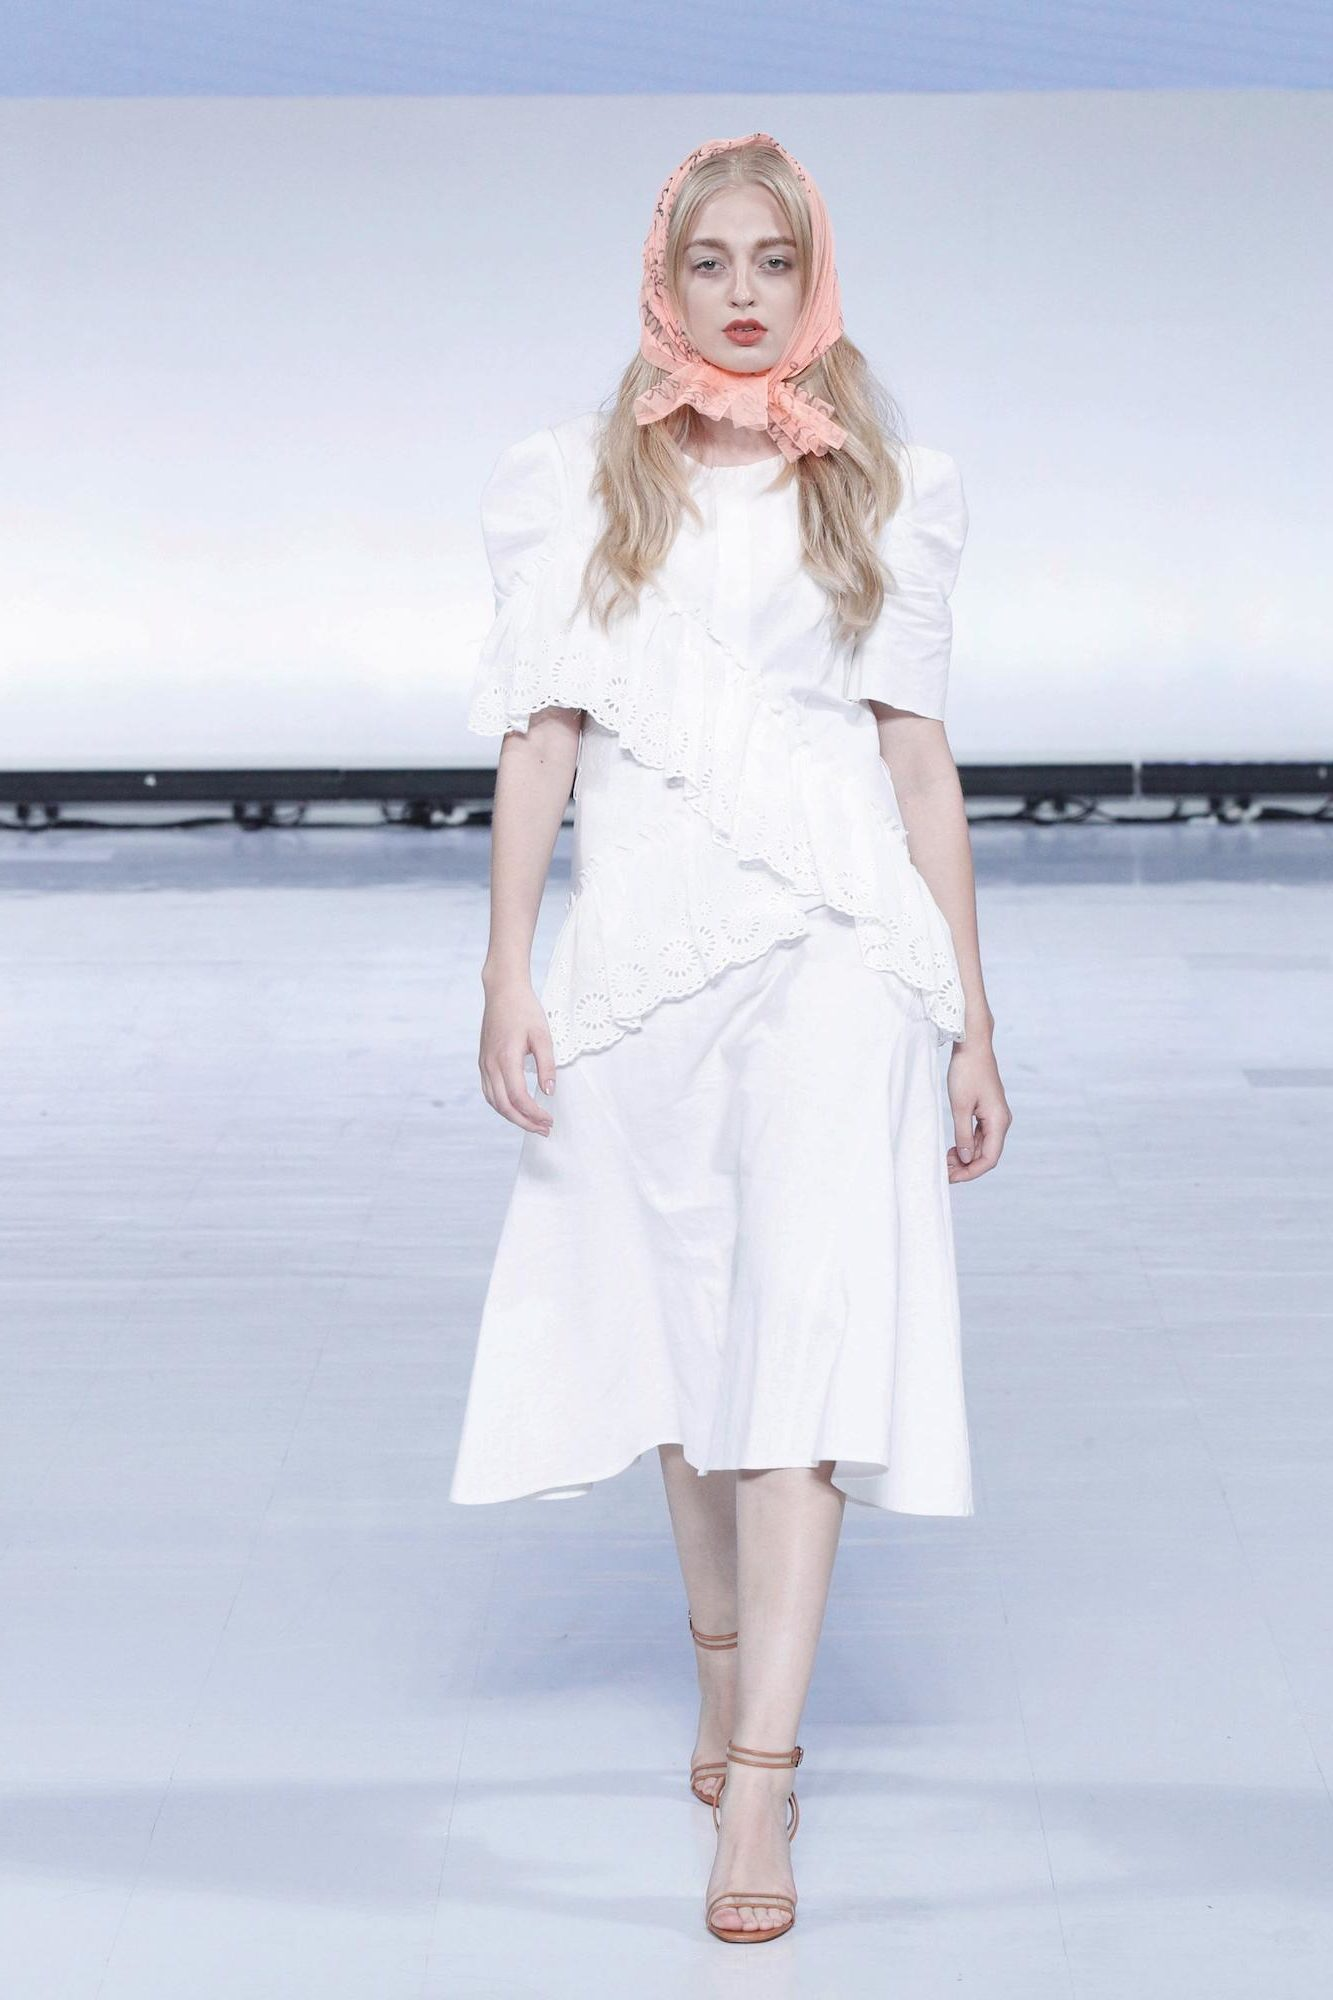 Wanita asia dengan model rambut pirang menggunakan scarf di atas kepala – Jakarta Fashion Week 2019